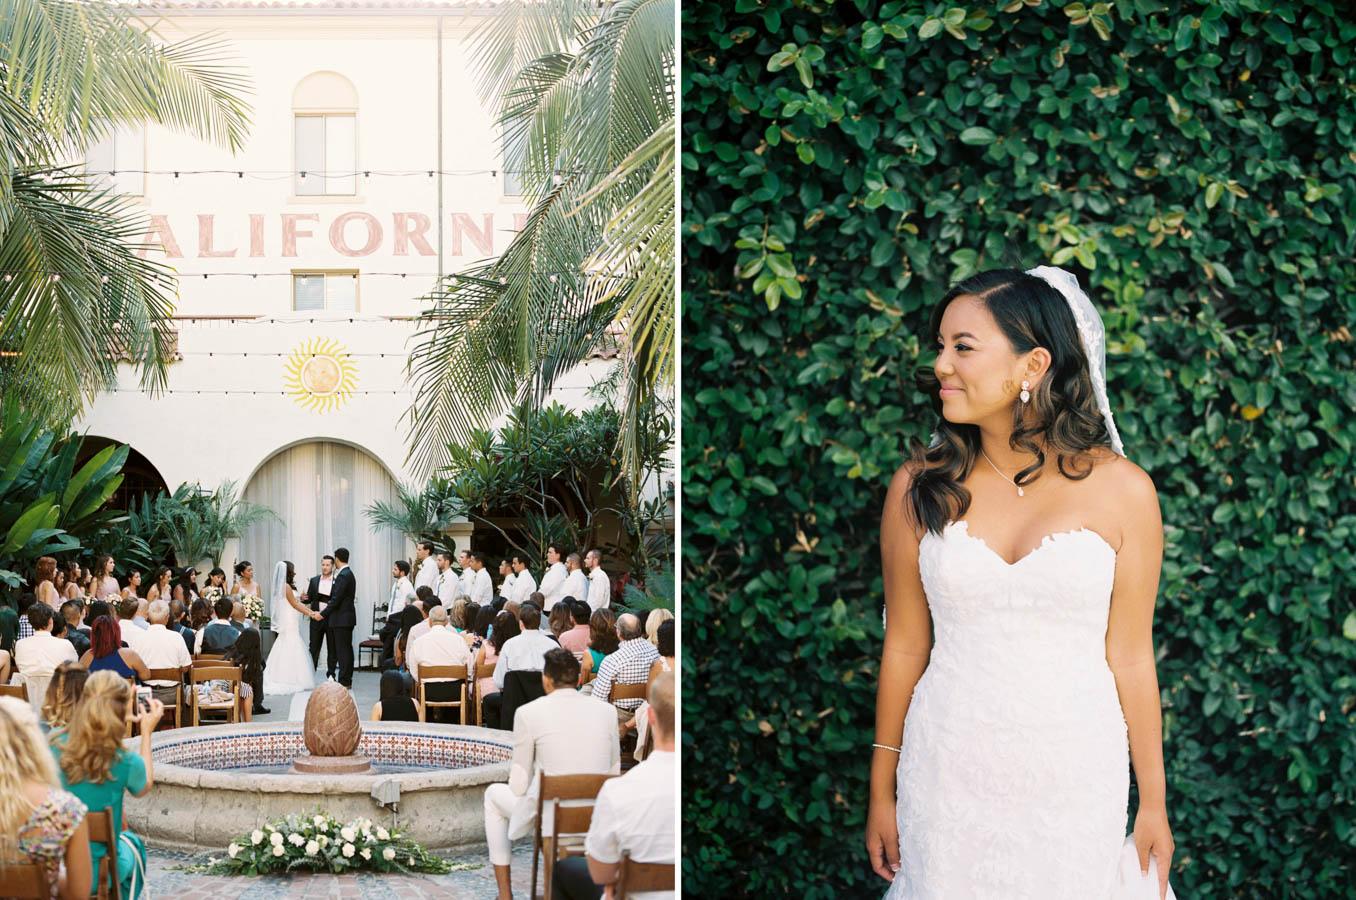 Alyssa Joy Photography - Los Angeles CA Film Wedding Photographer - Fullerton CA Wedding